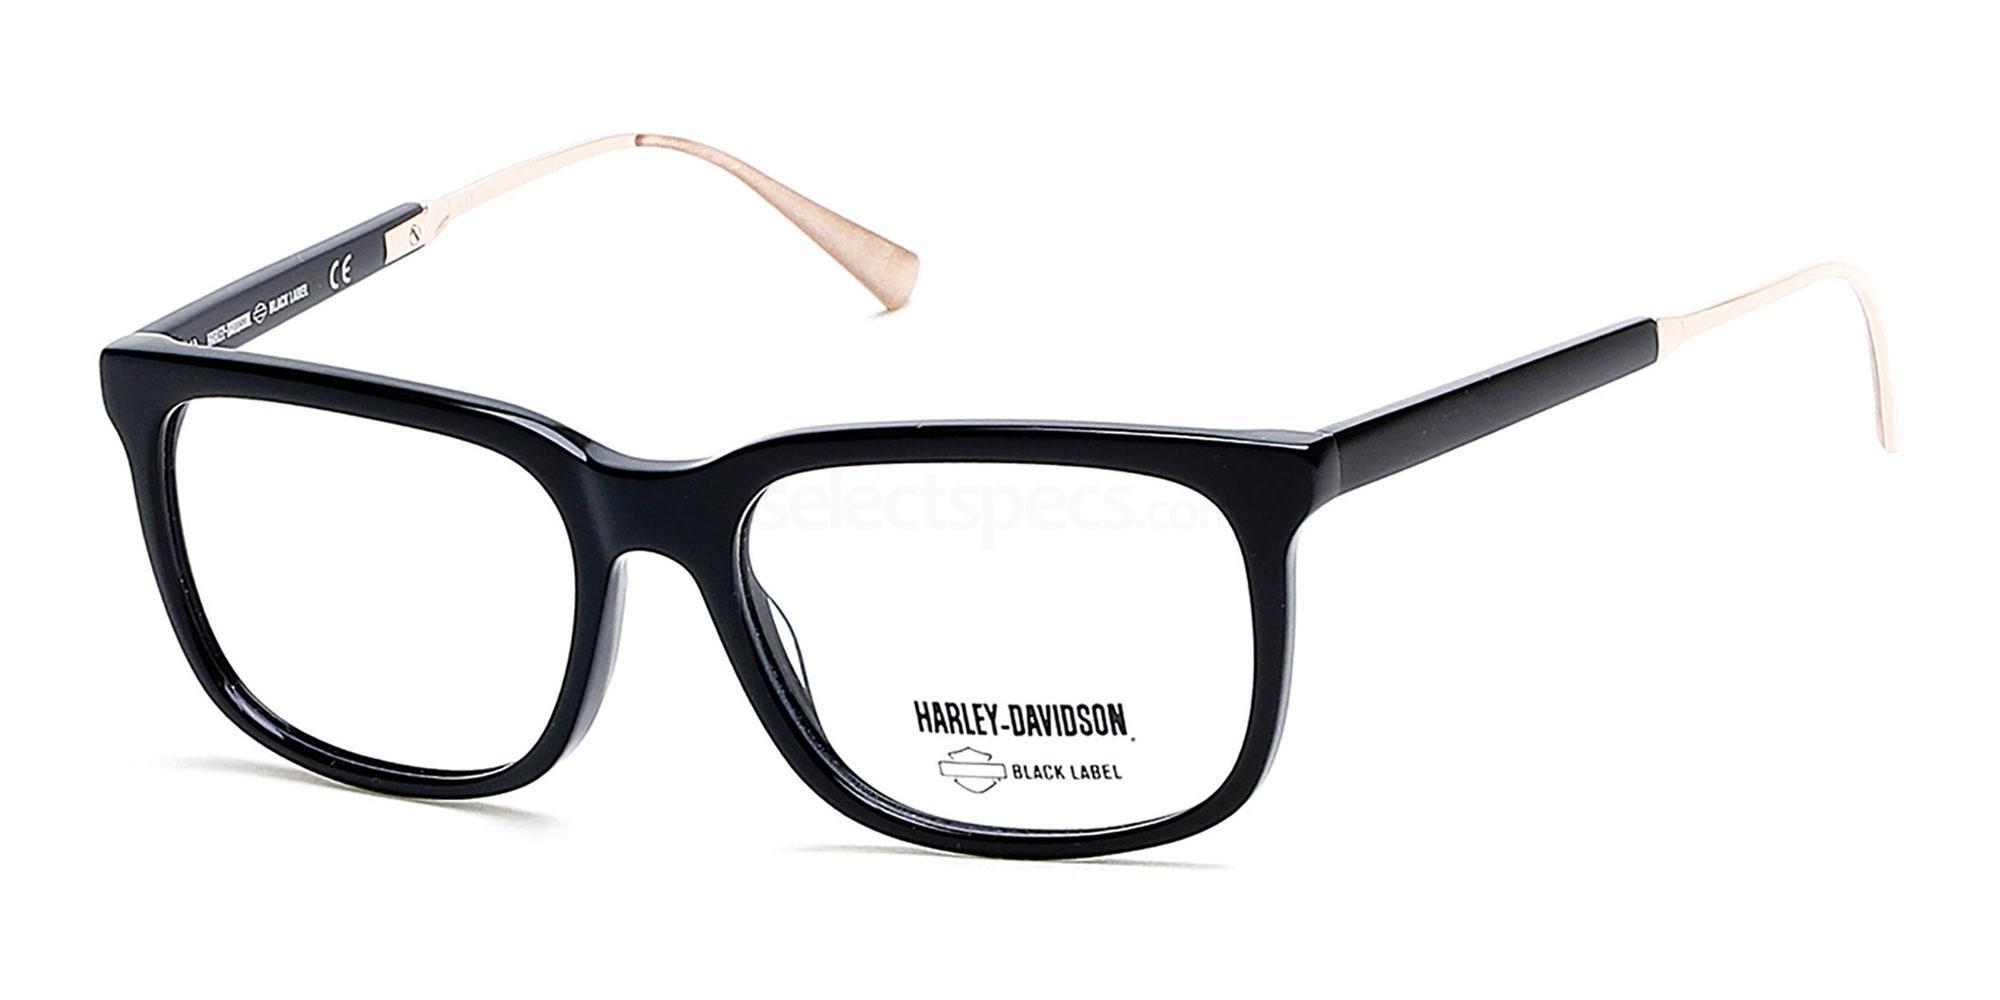 001 HD 1026 Glasses, Harley Davidson